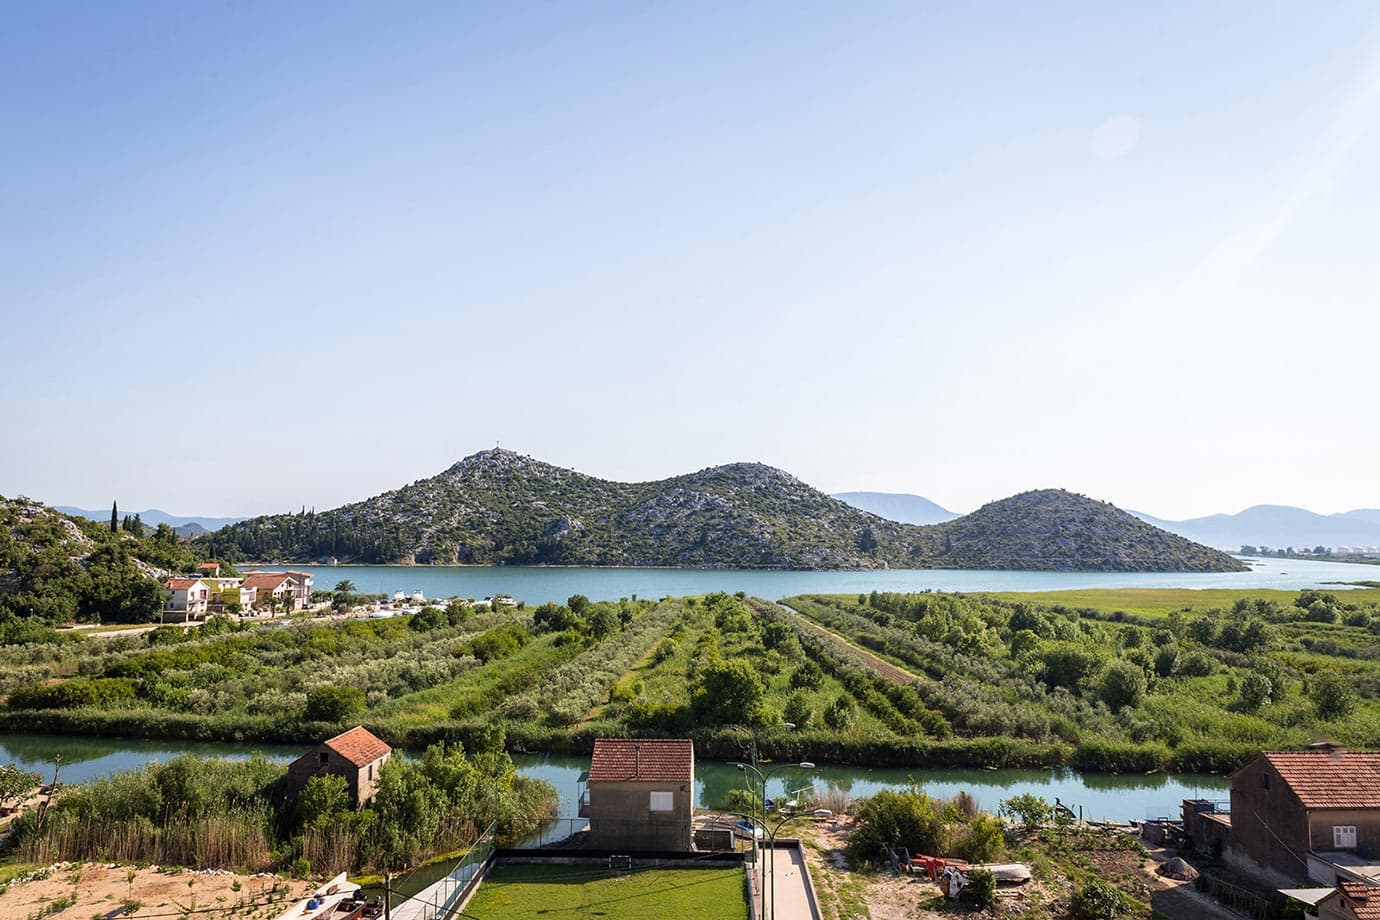 View of Croatia